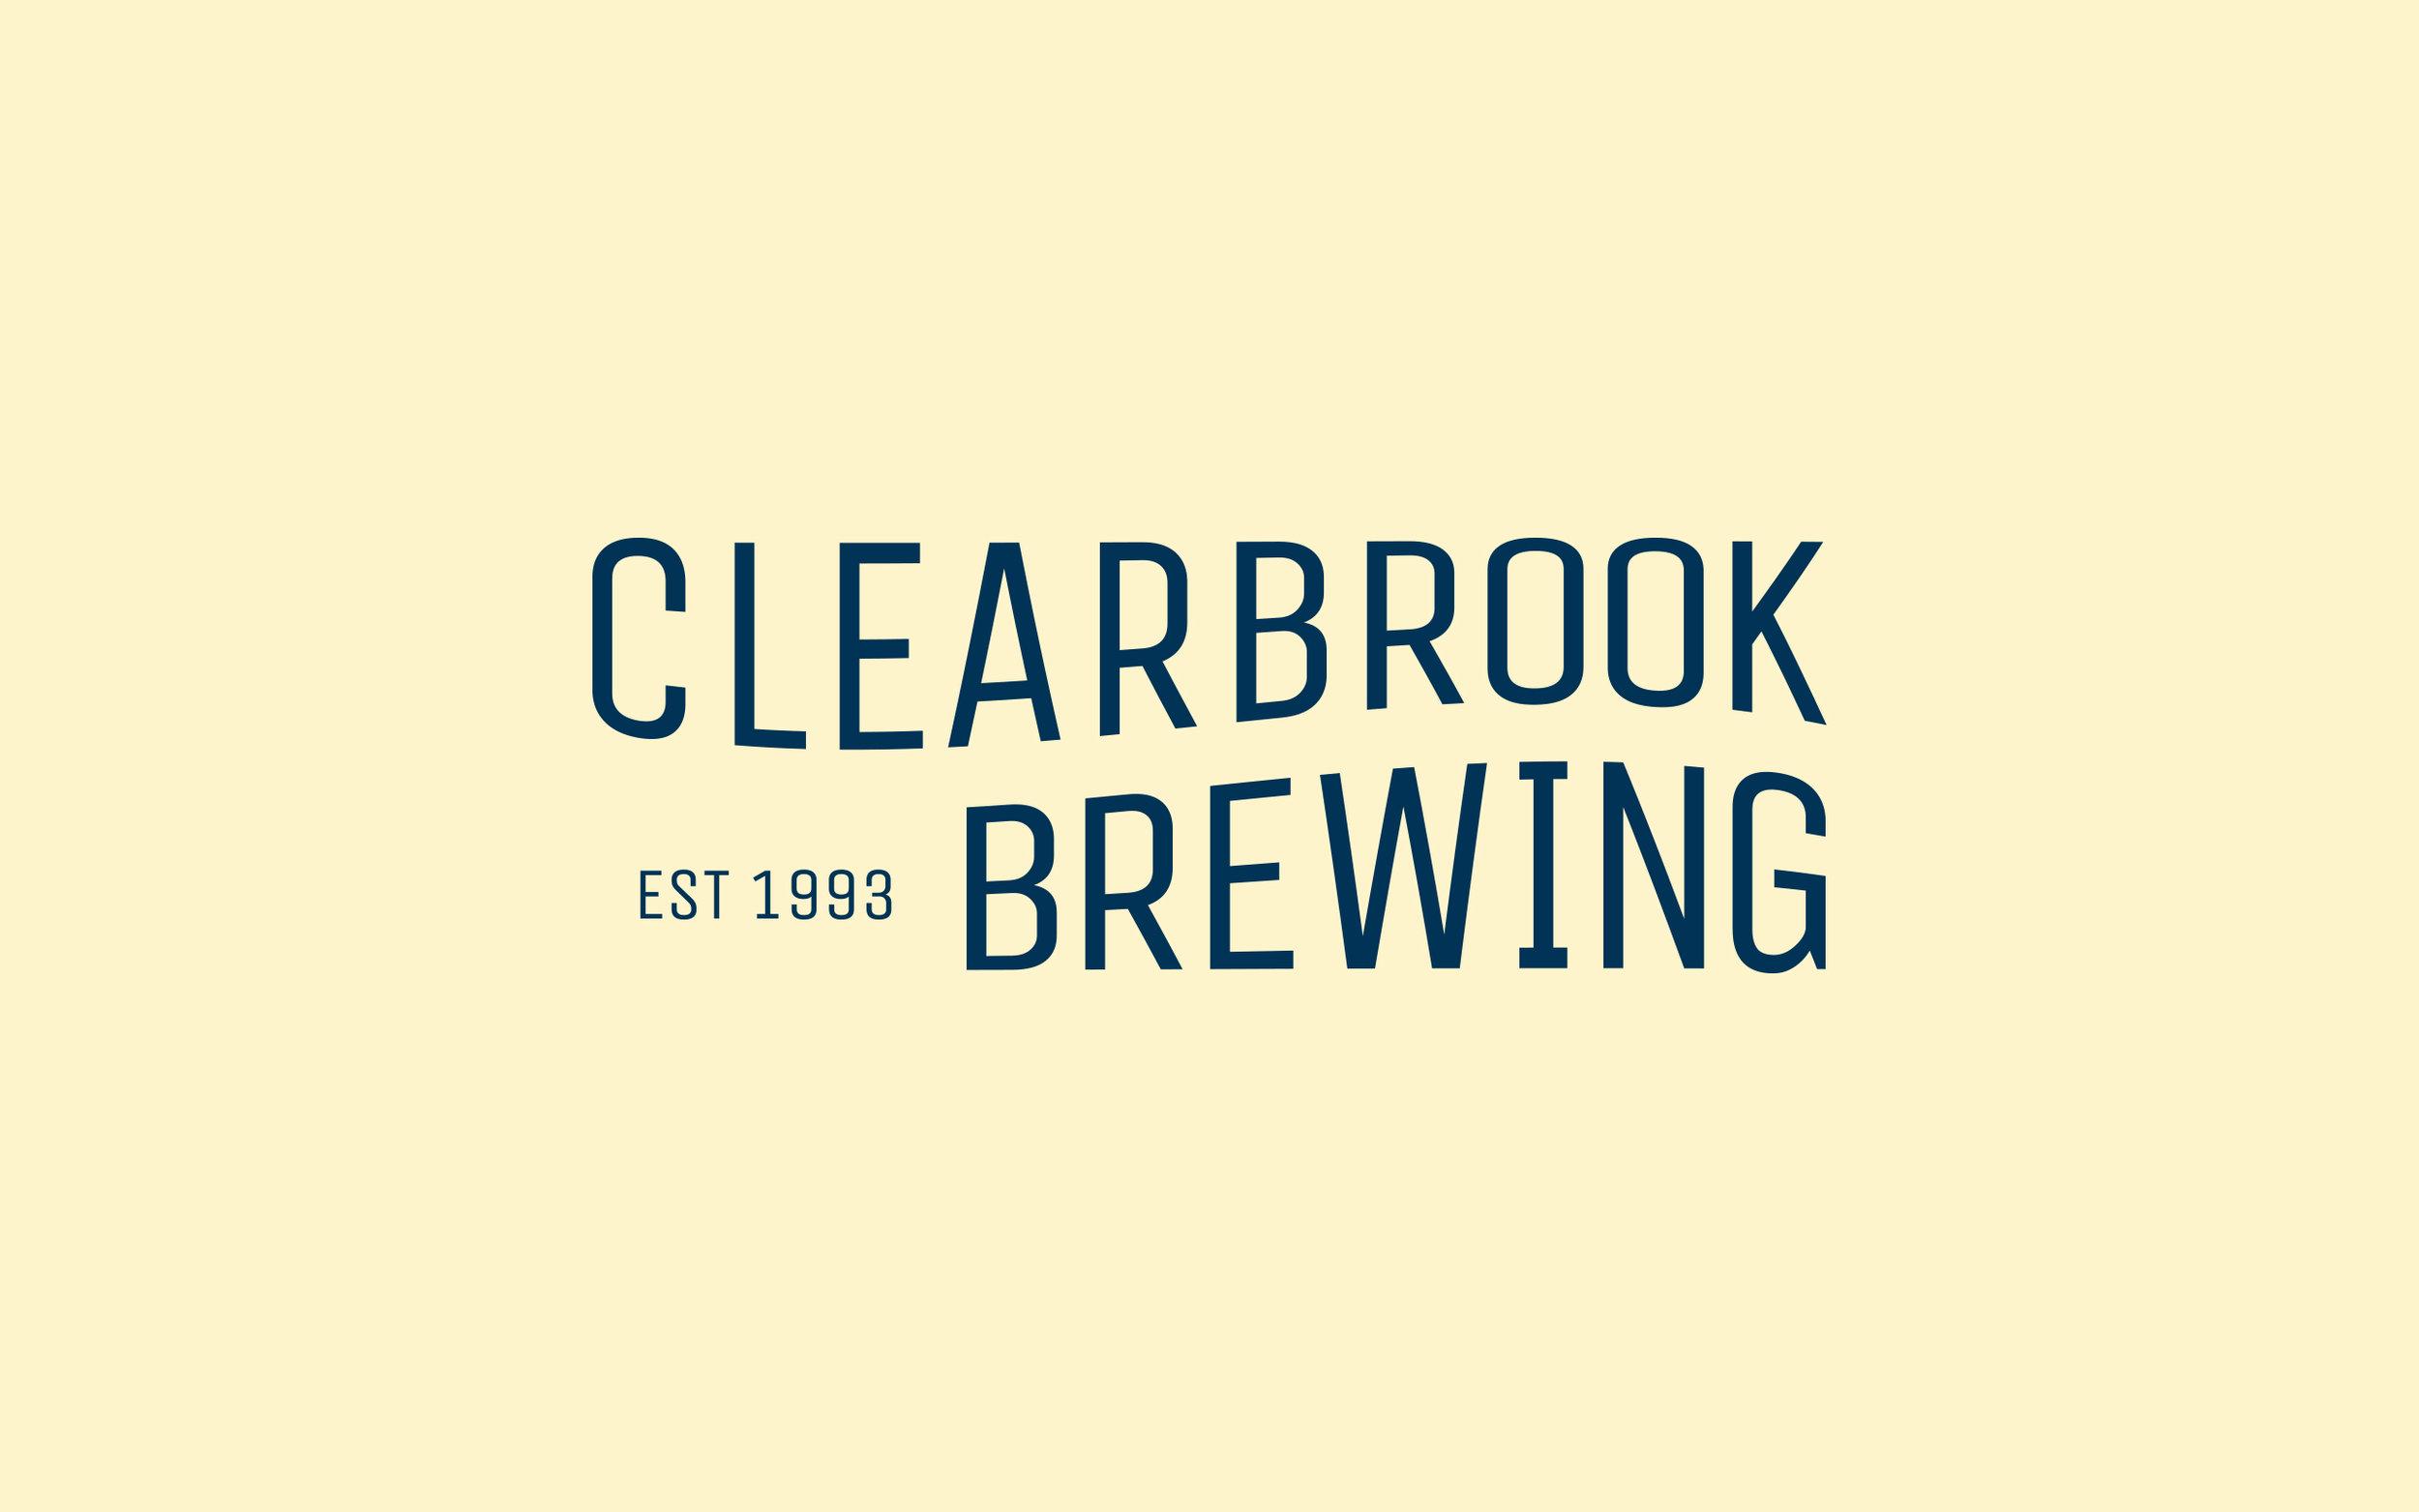 clearbrook-brewing-logo.jpg